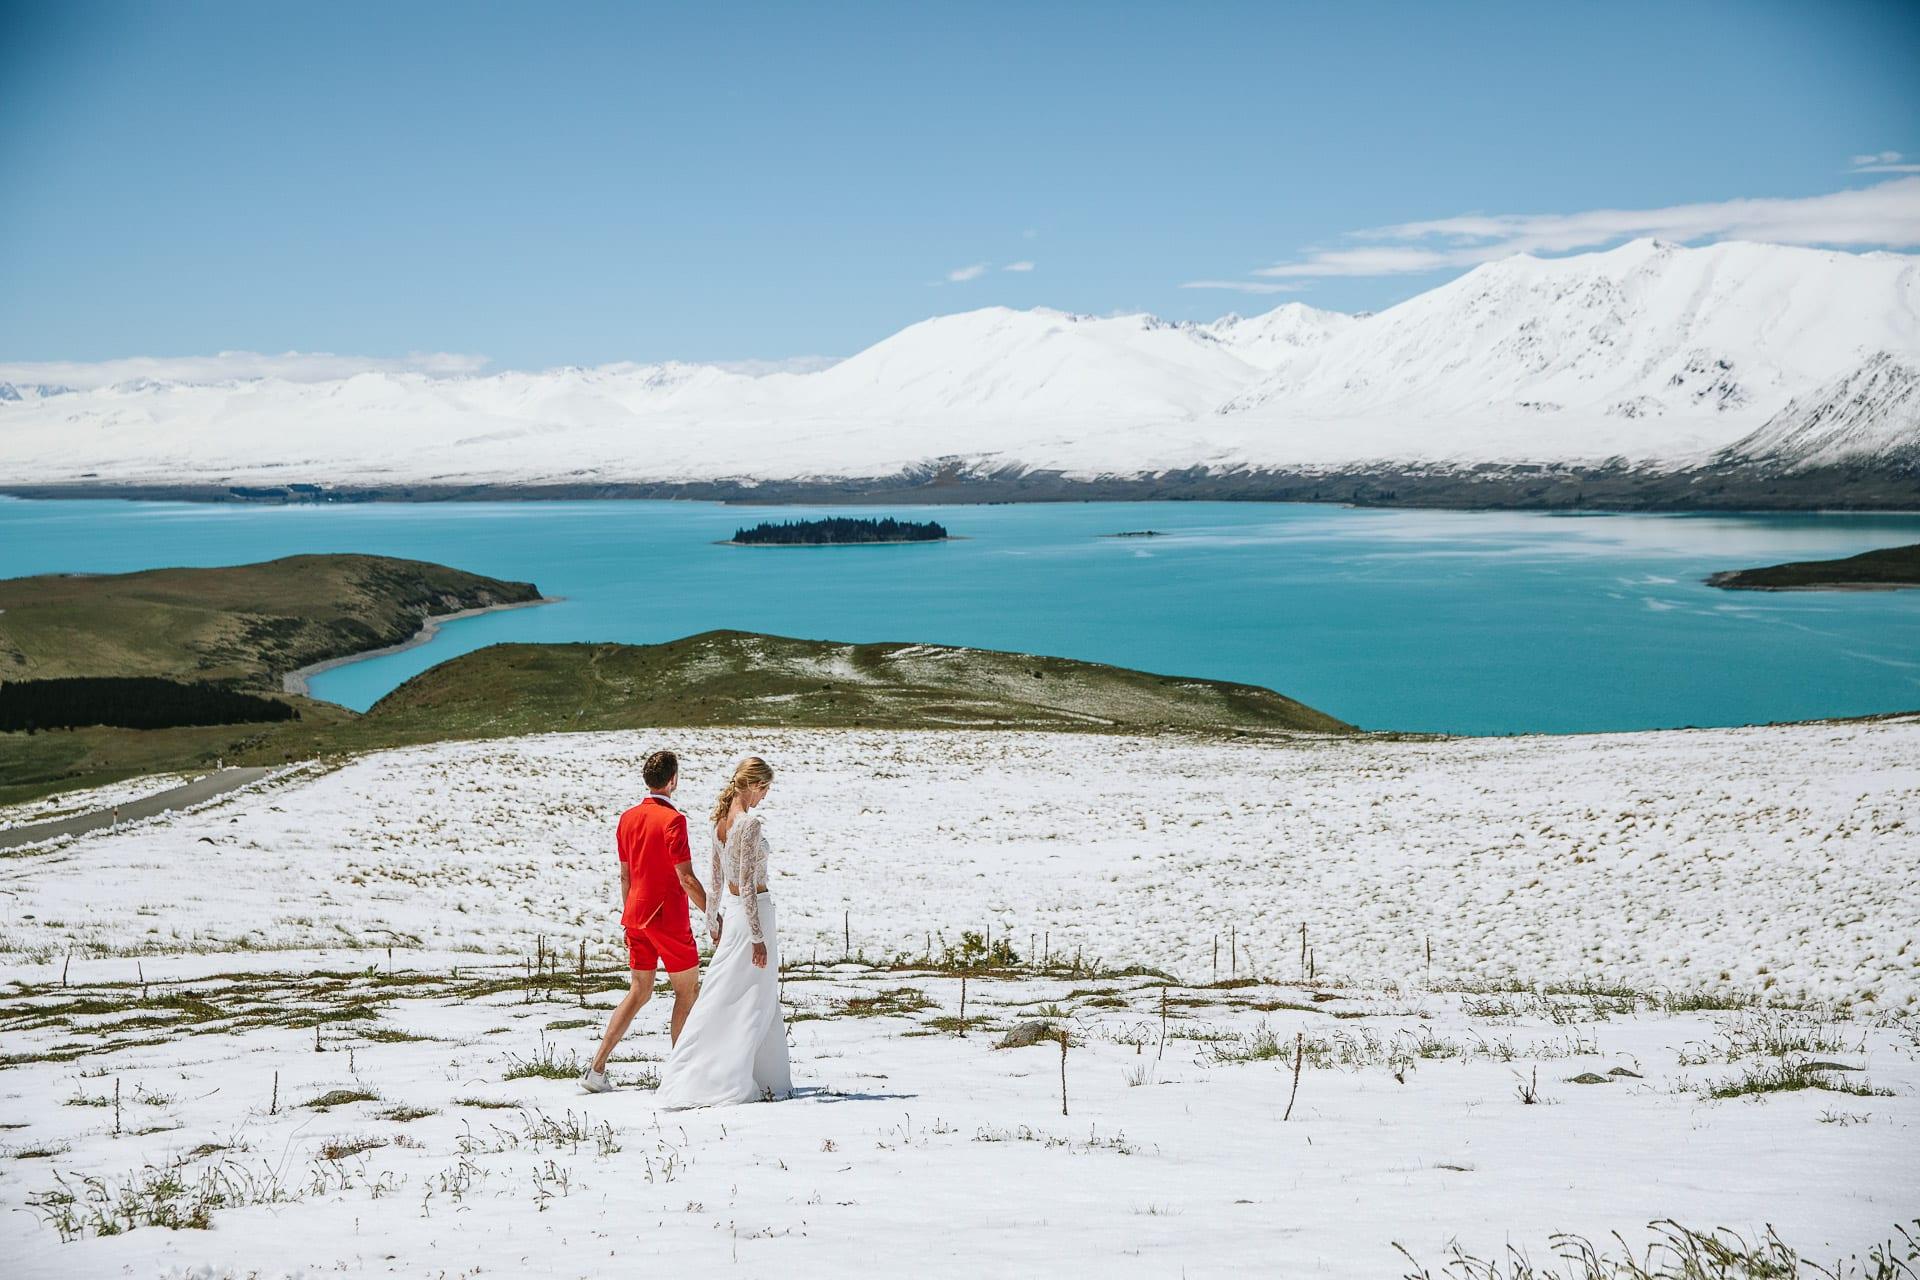 Tanja and Dirkjan's magical snowy wedding at Lake Tekapo